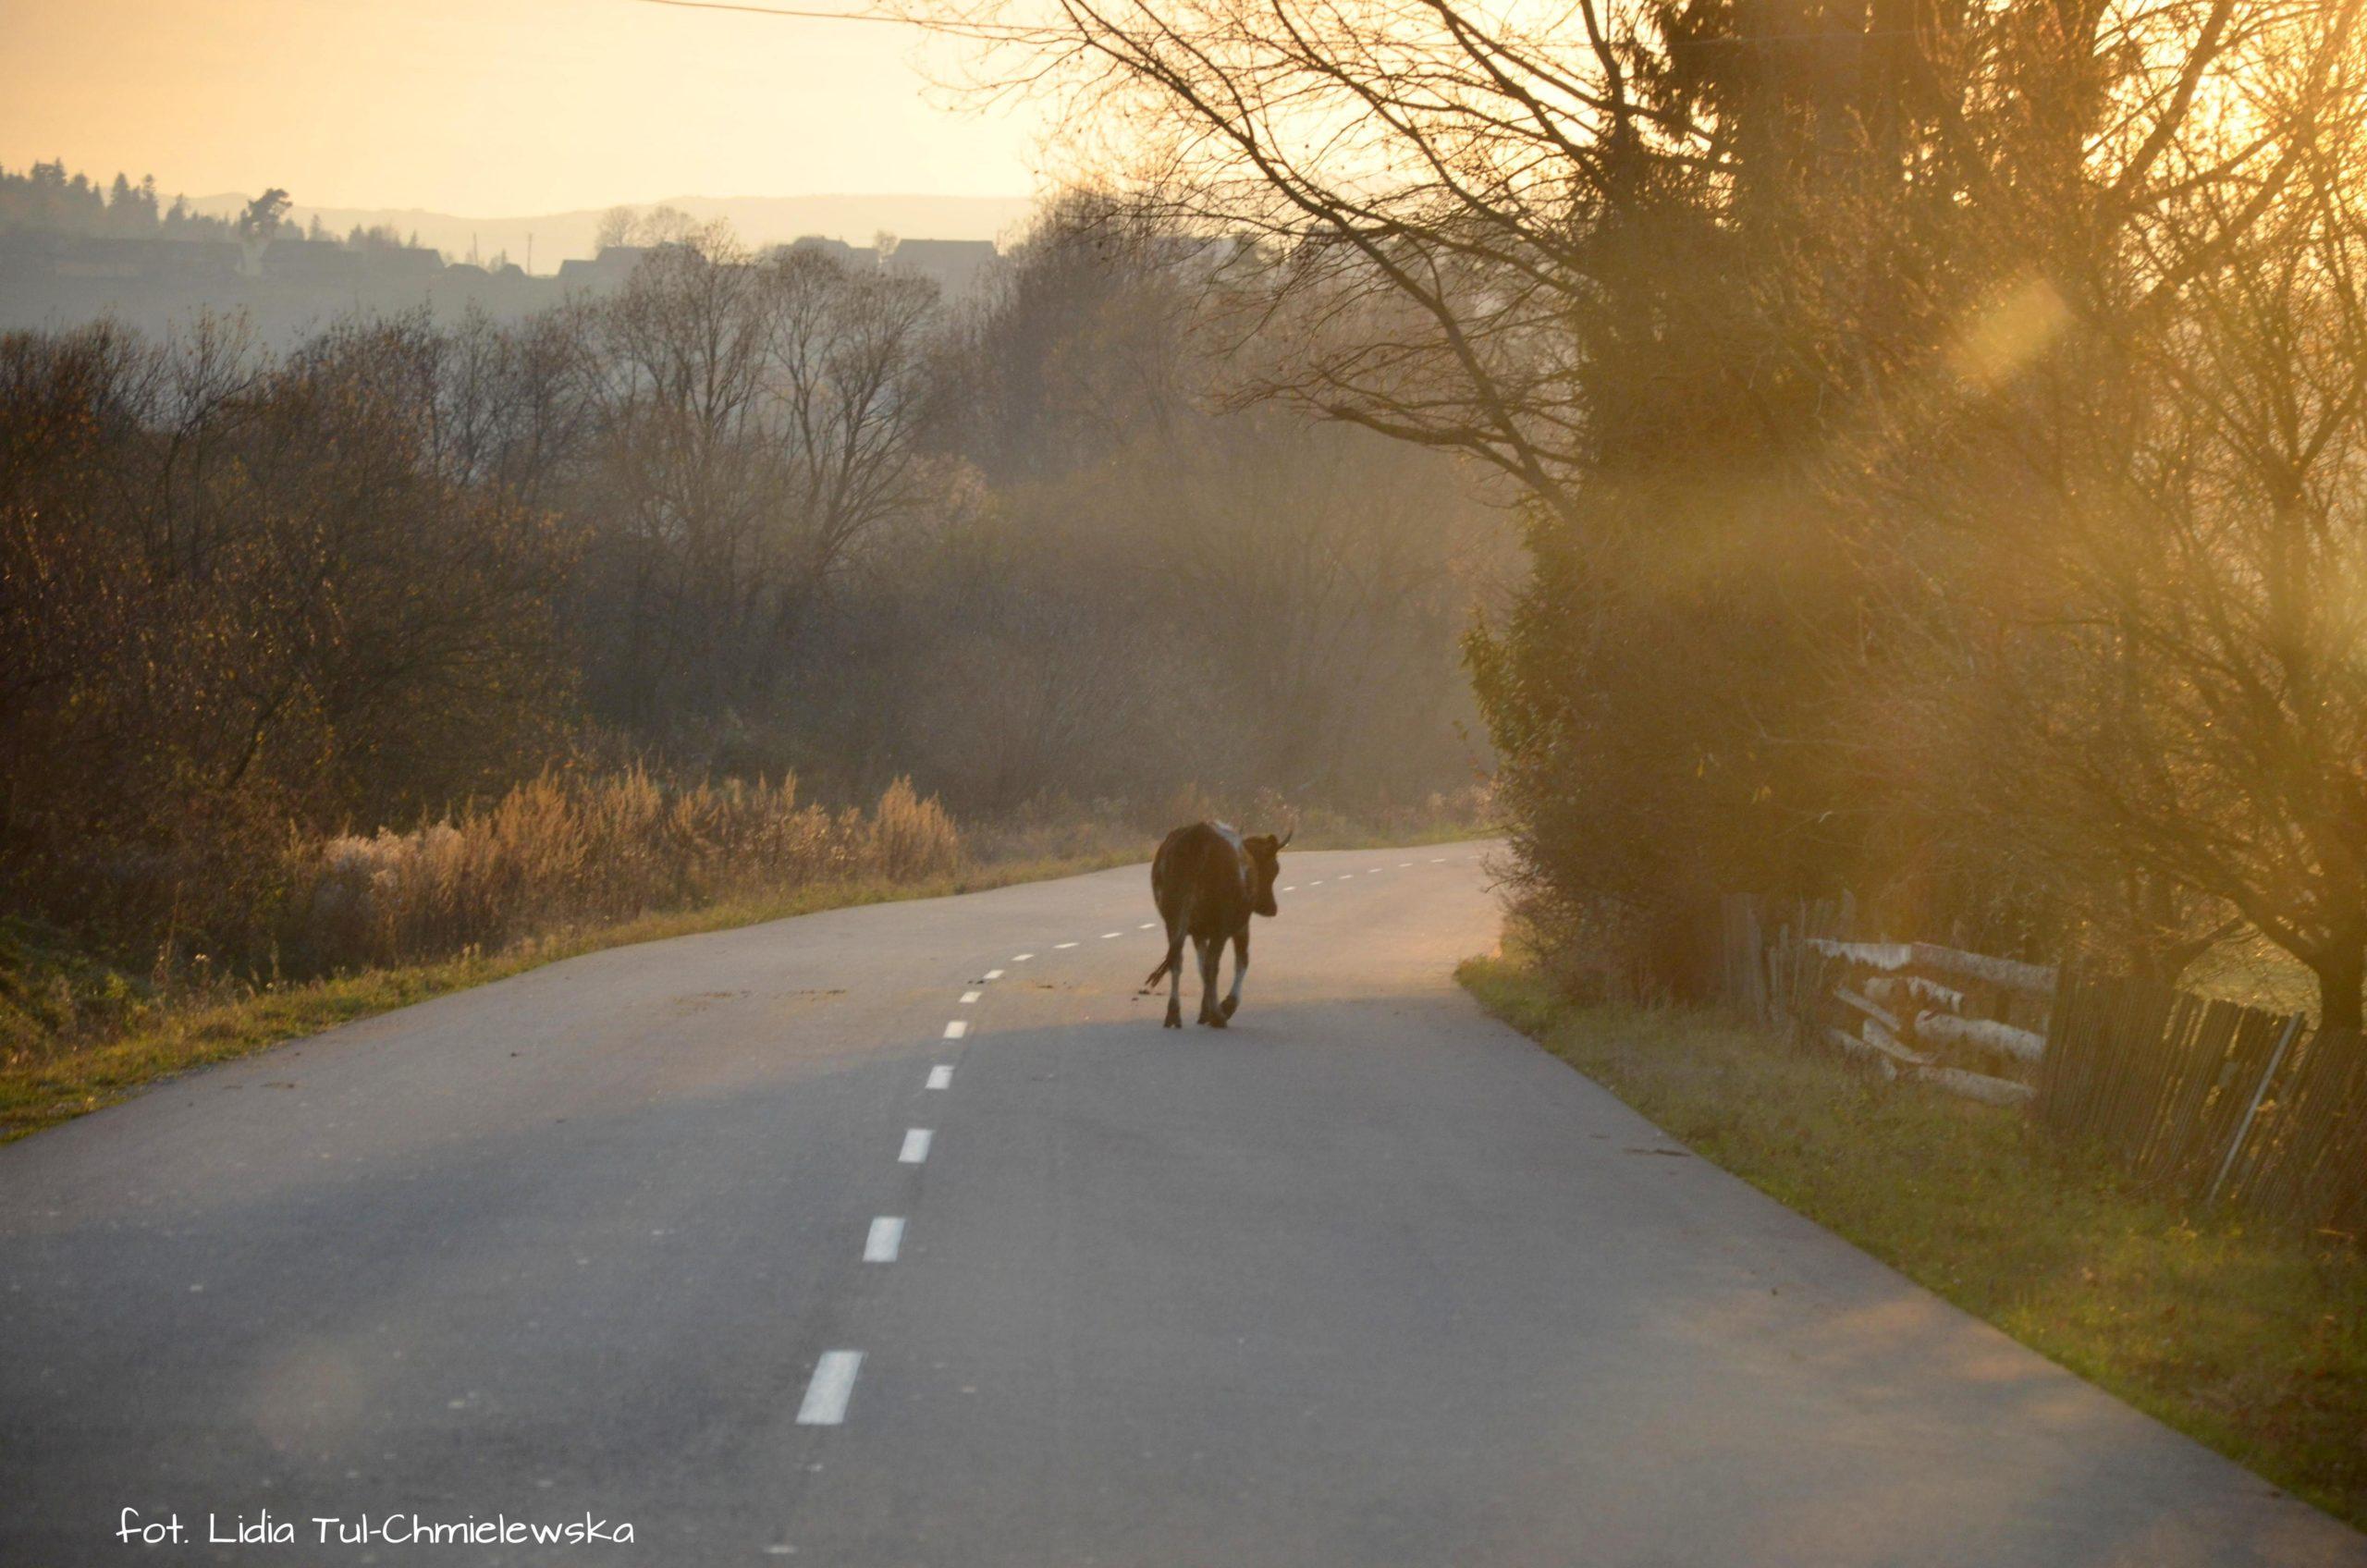 Na drogach Ukrainy fot. Lidia Tul-Chmielewska